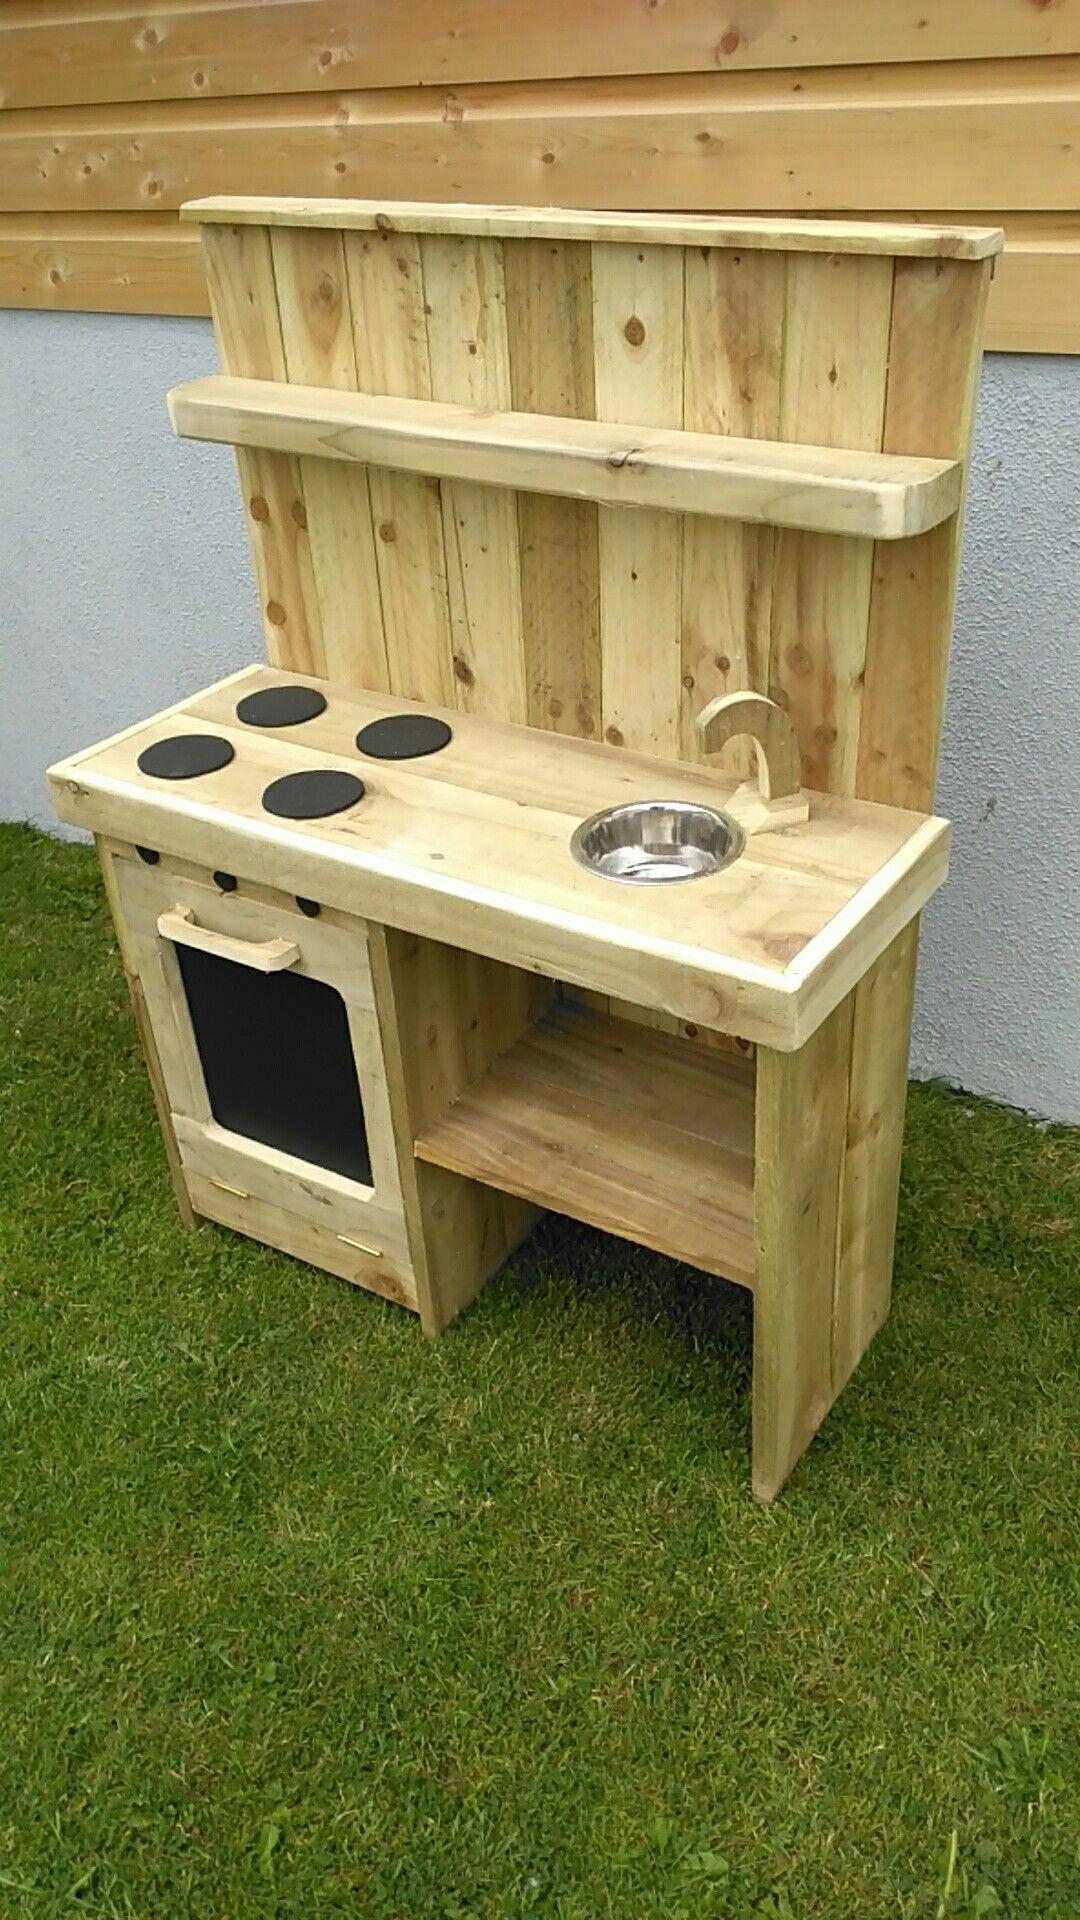 Child S Play Kitchen Idea From Pinterest Madebyjp Kids Play Kitchen Play Kitchen Wooden Play Kitchen